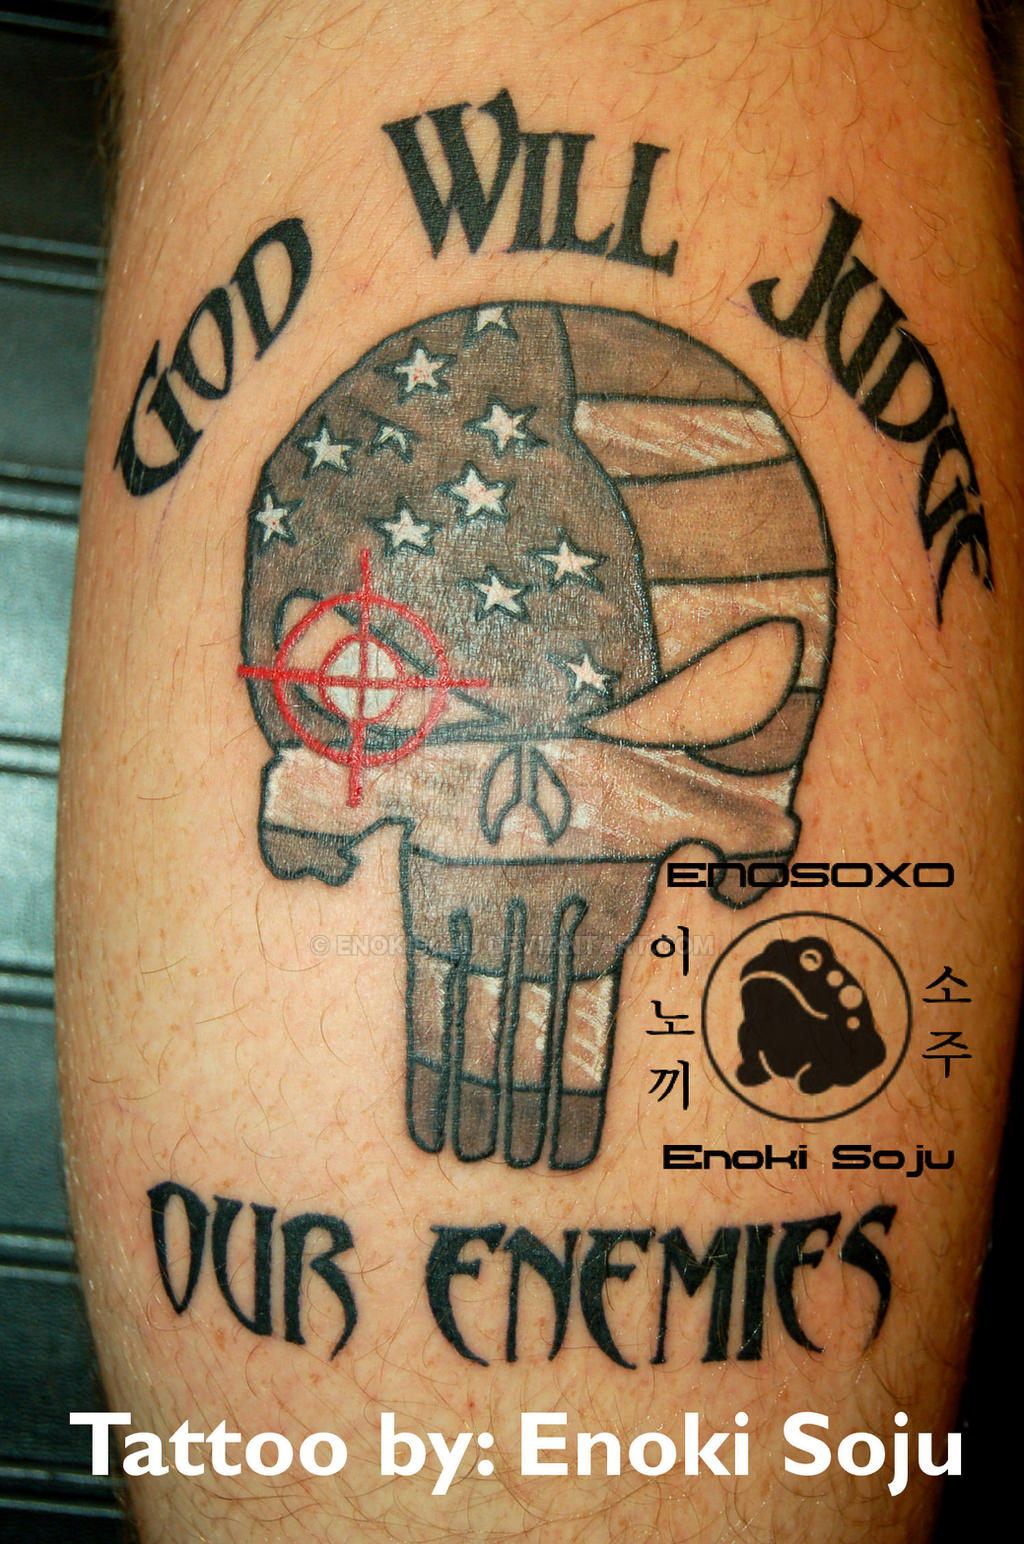 Custom punisher skull american flag tattoo by enokisoju on for Texas tattoo license